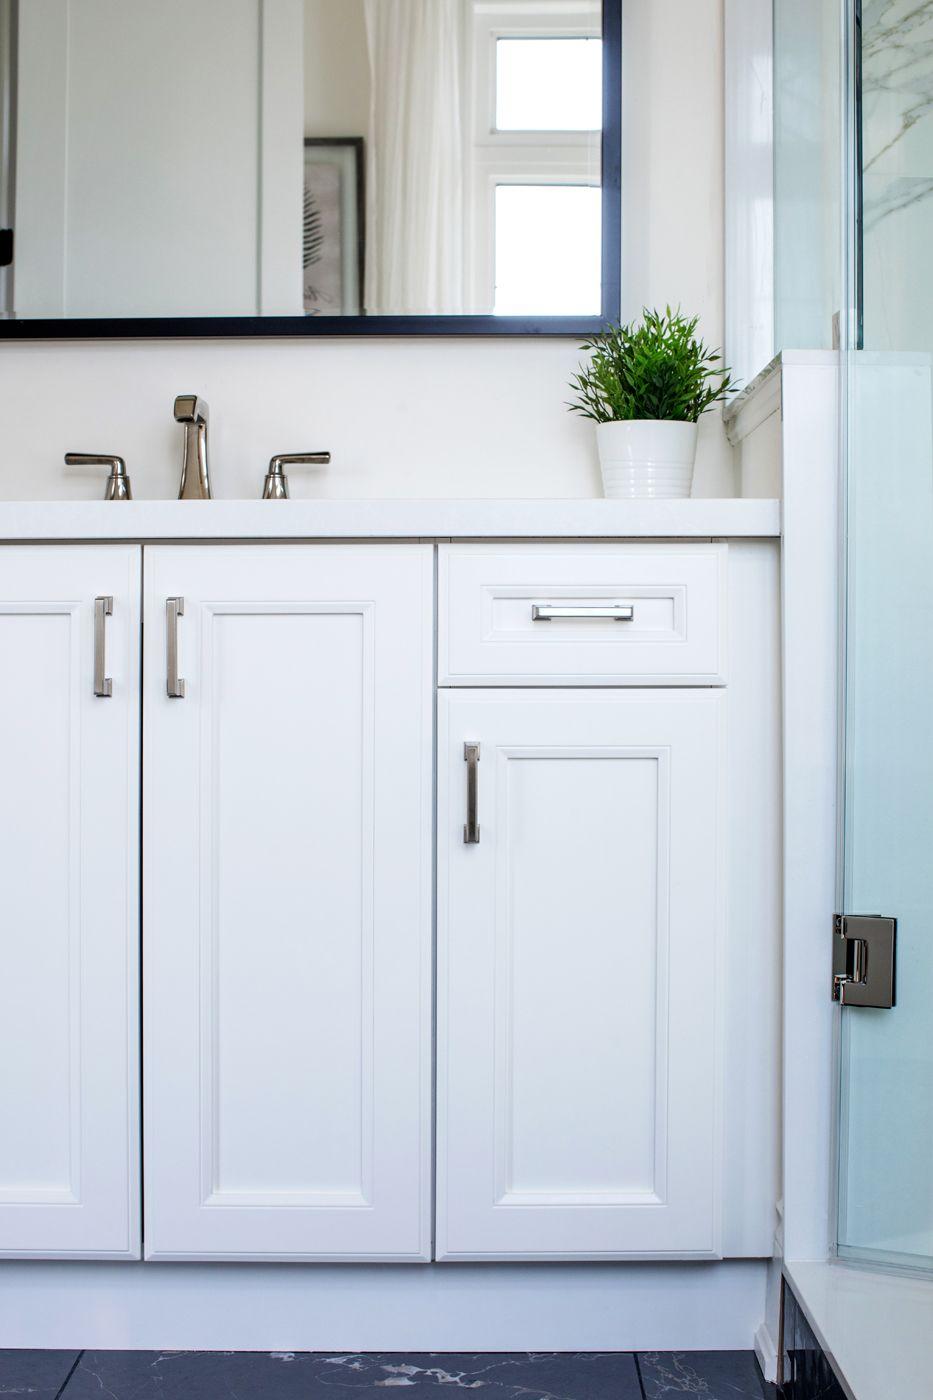 quartz countertops san diego bathroom master ensuite maple cabinets with quartz countertops sandiego homes innisfil ora kitchens and bath orillia ontario